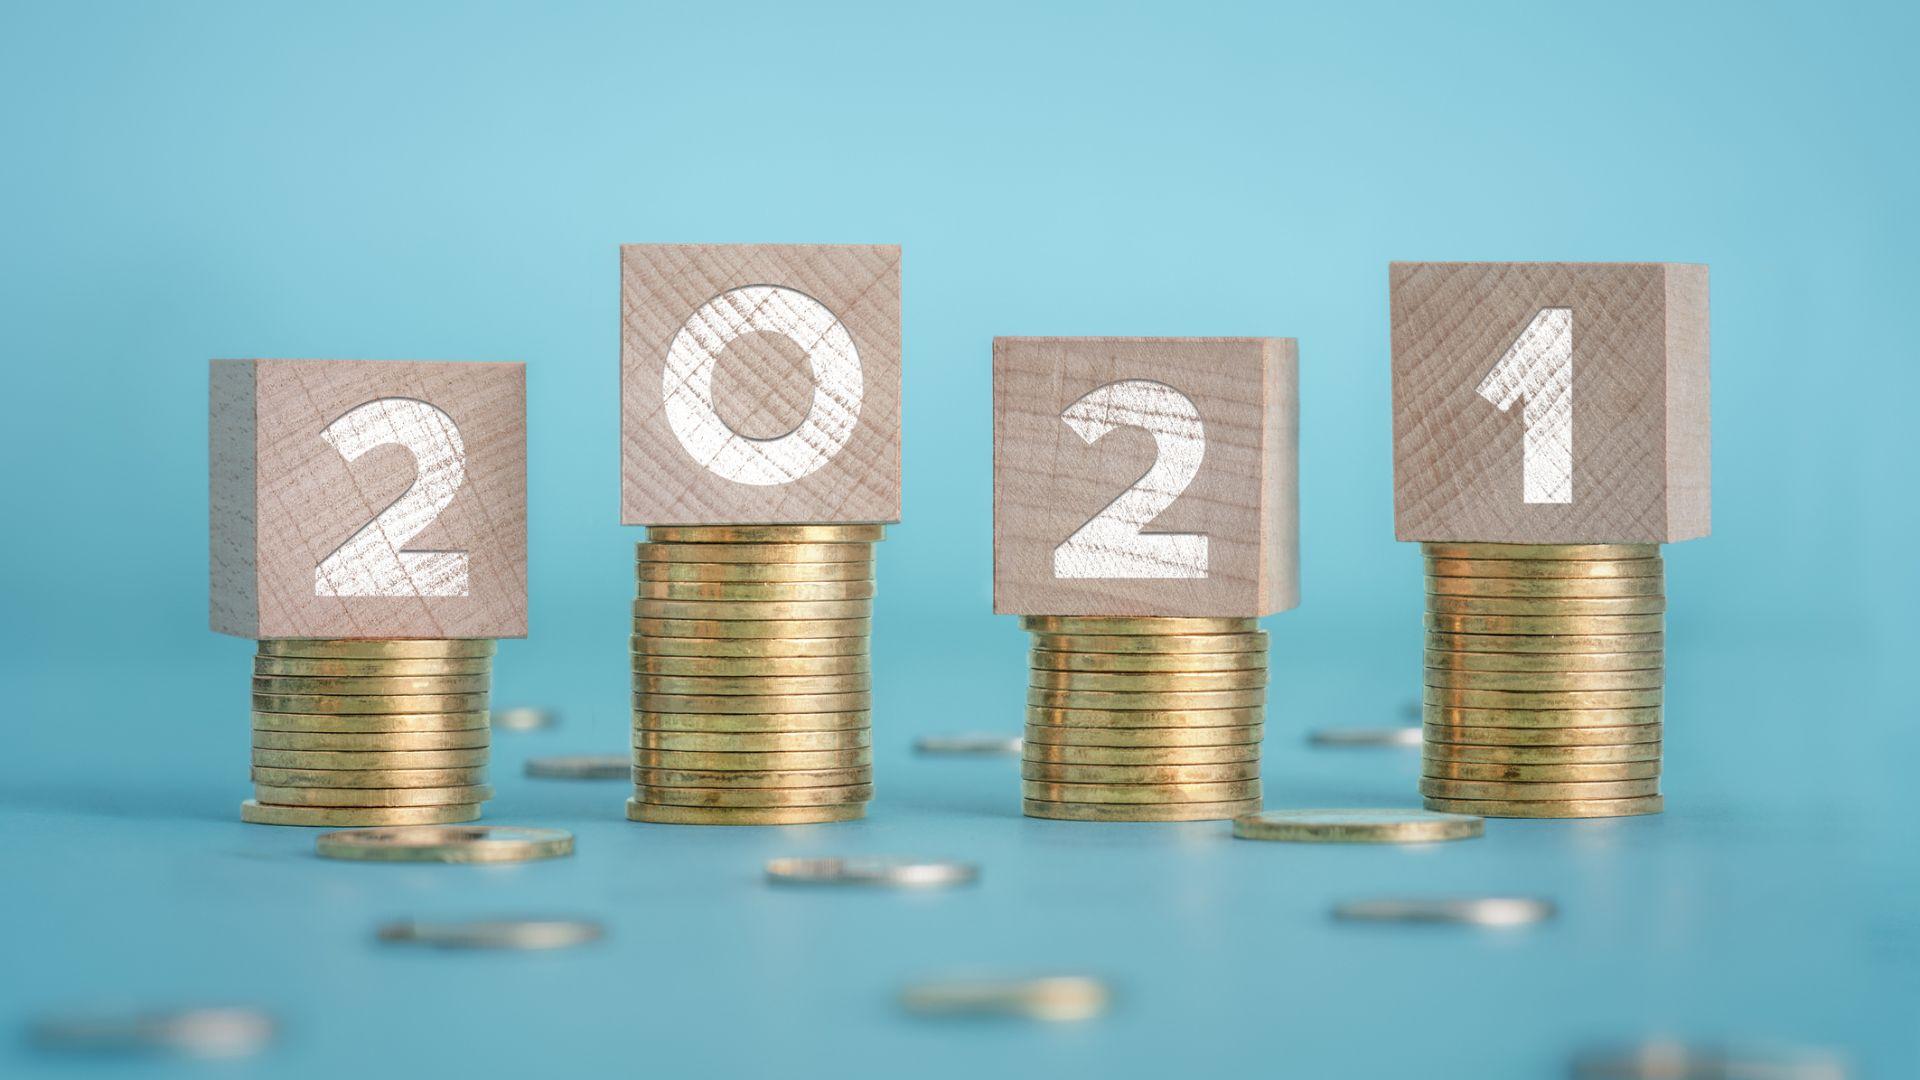 Приеха Бюджет 2021: какви са приоритетите